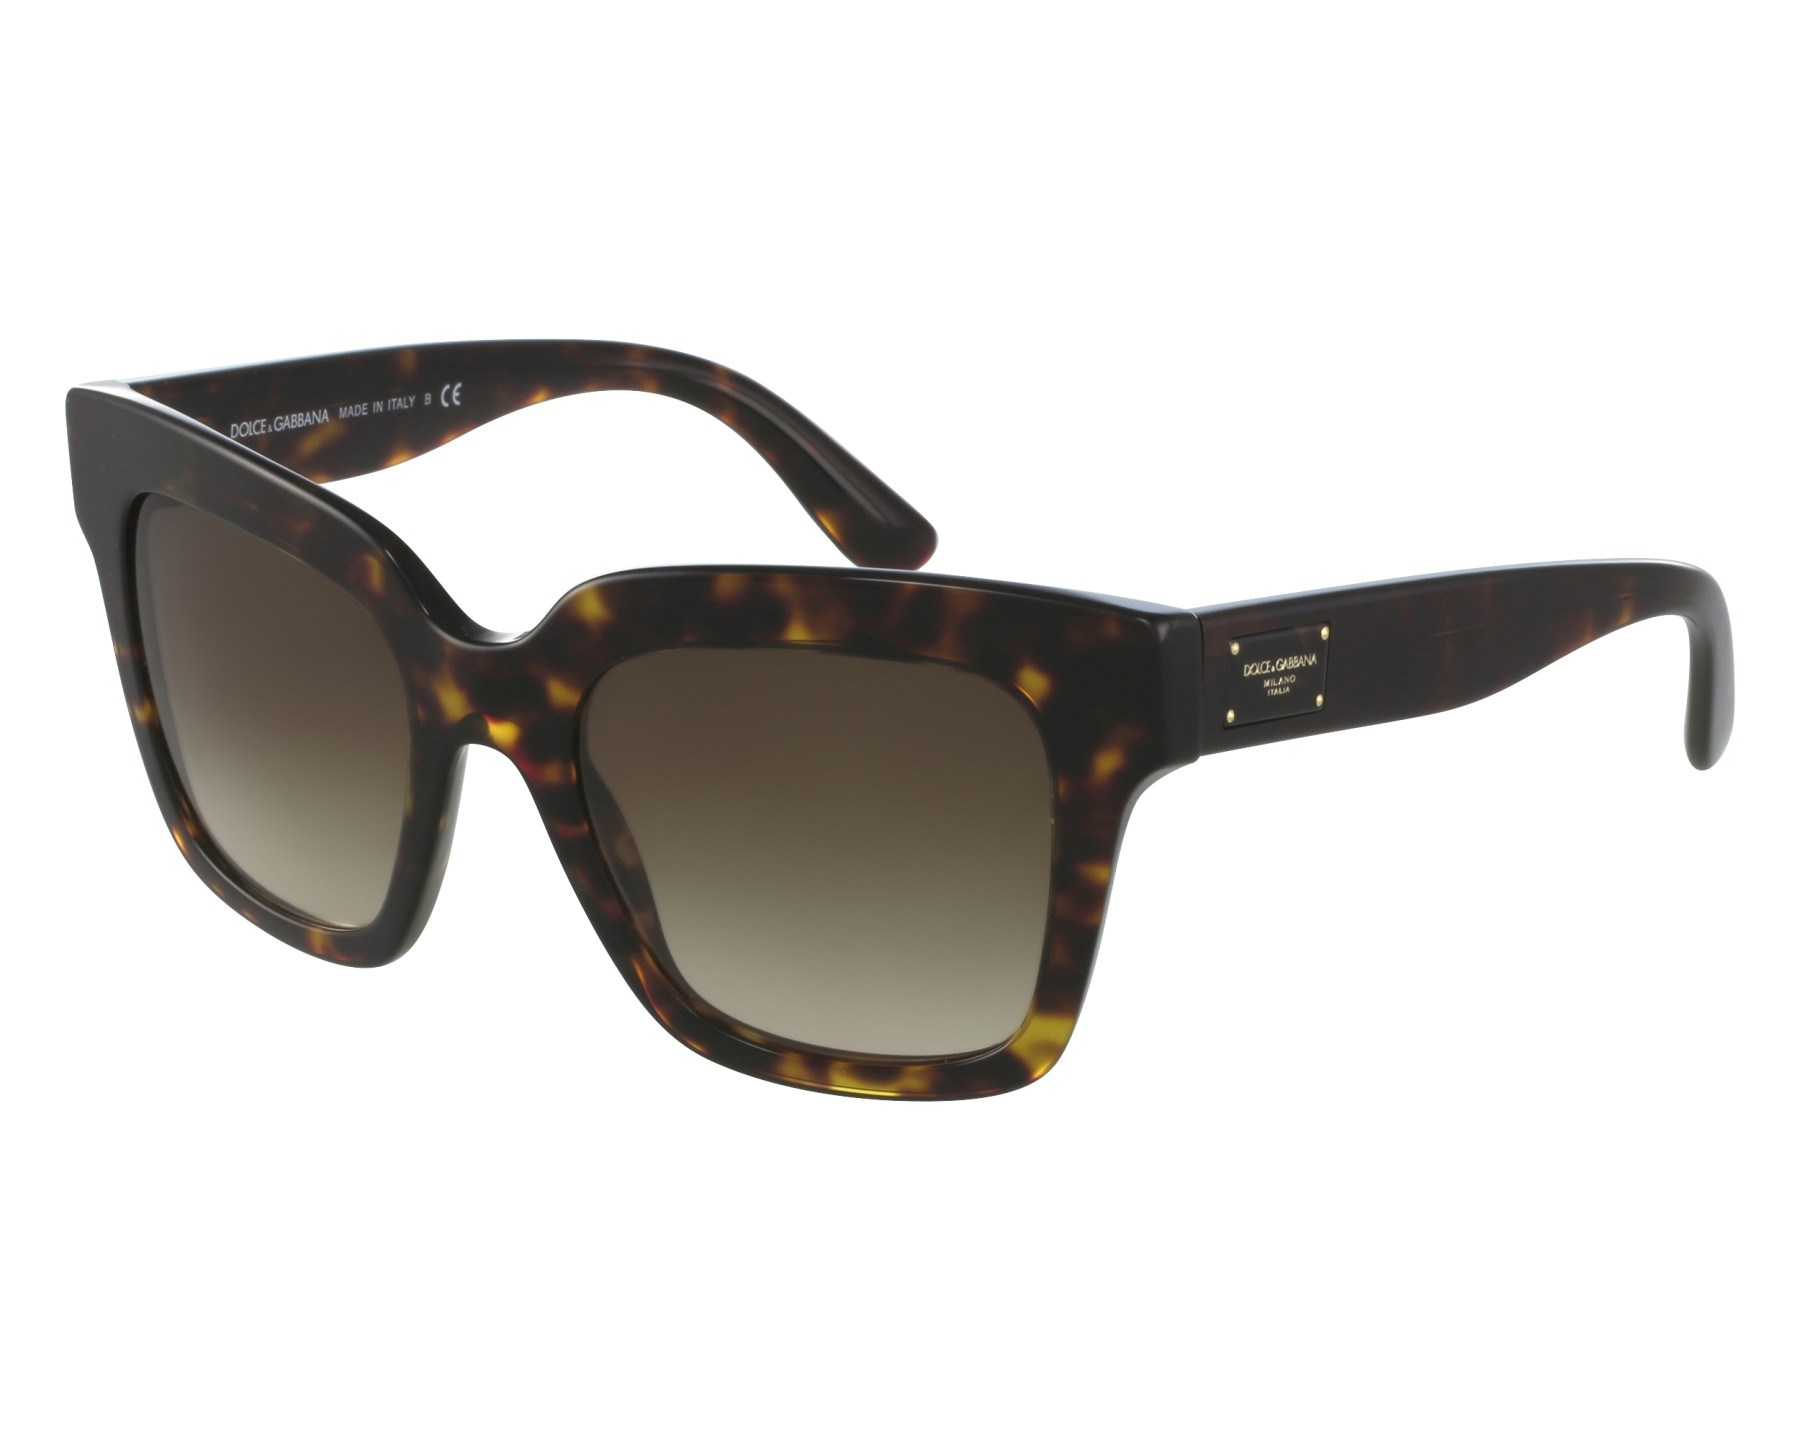 Dolce & Gabbana DG4286 502/13 51 mm/20 mm i6R3f59